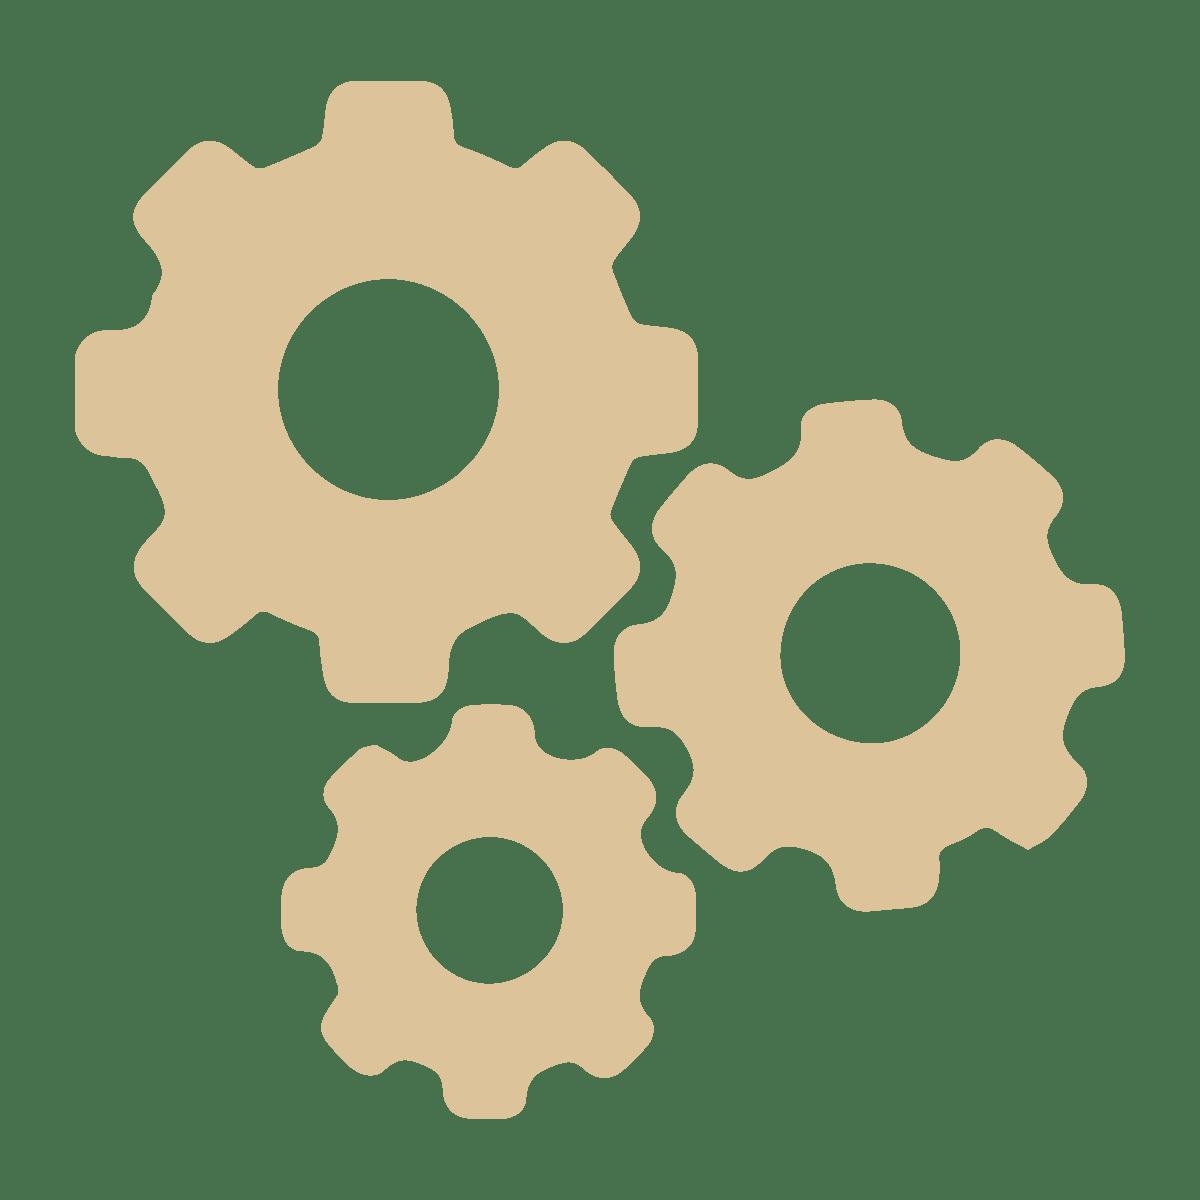 arvense-group-5f-methodology-step-4-fix-tan